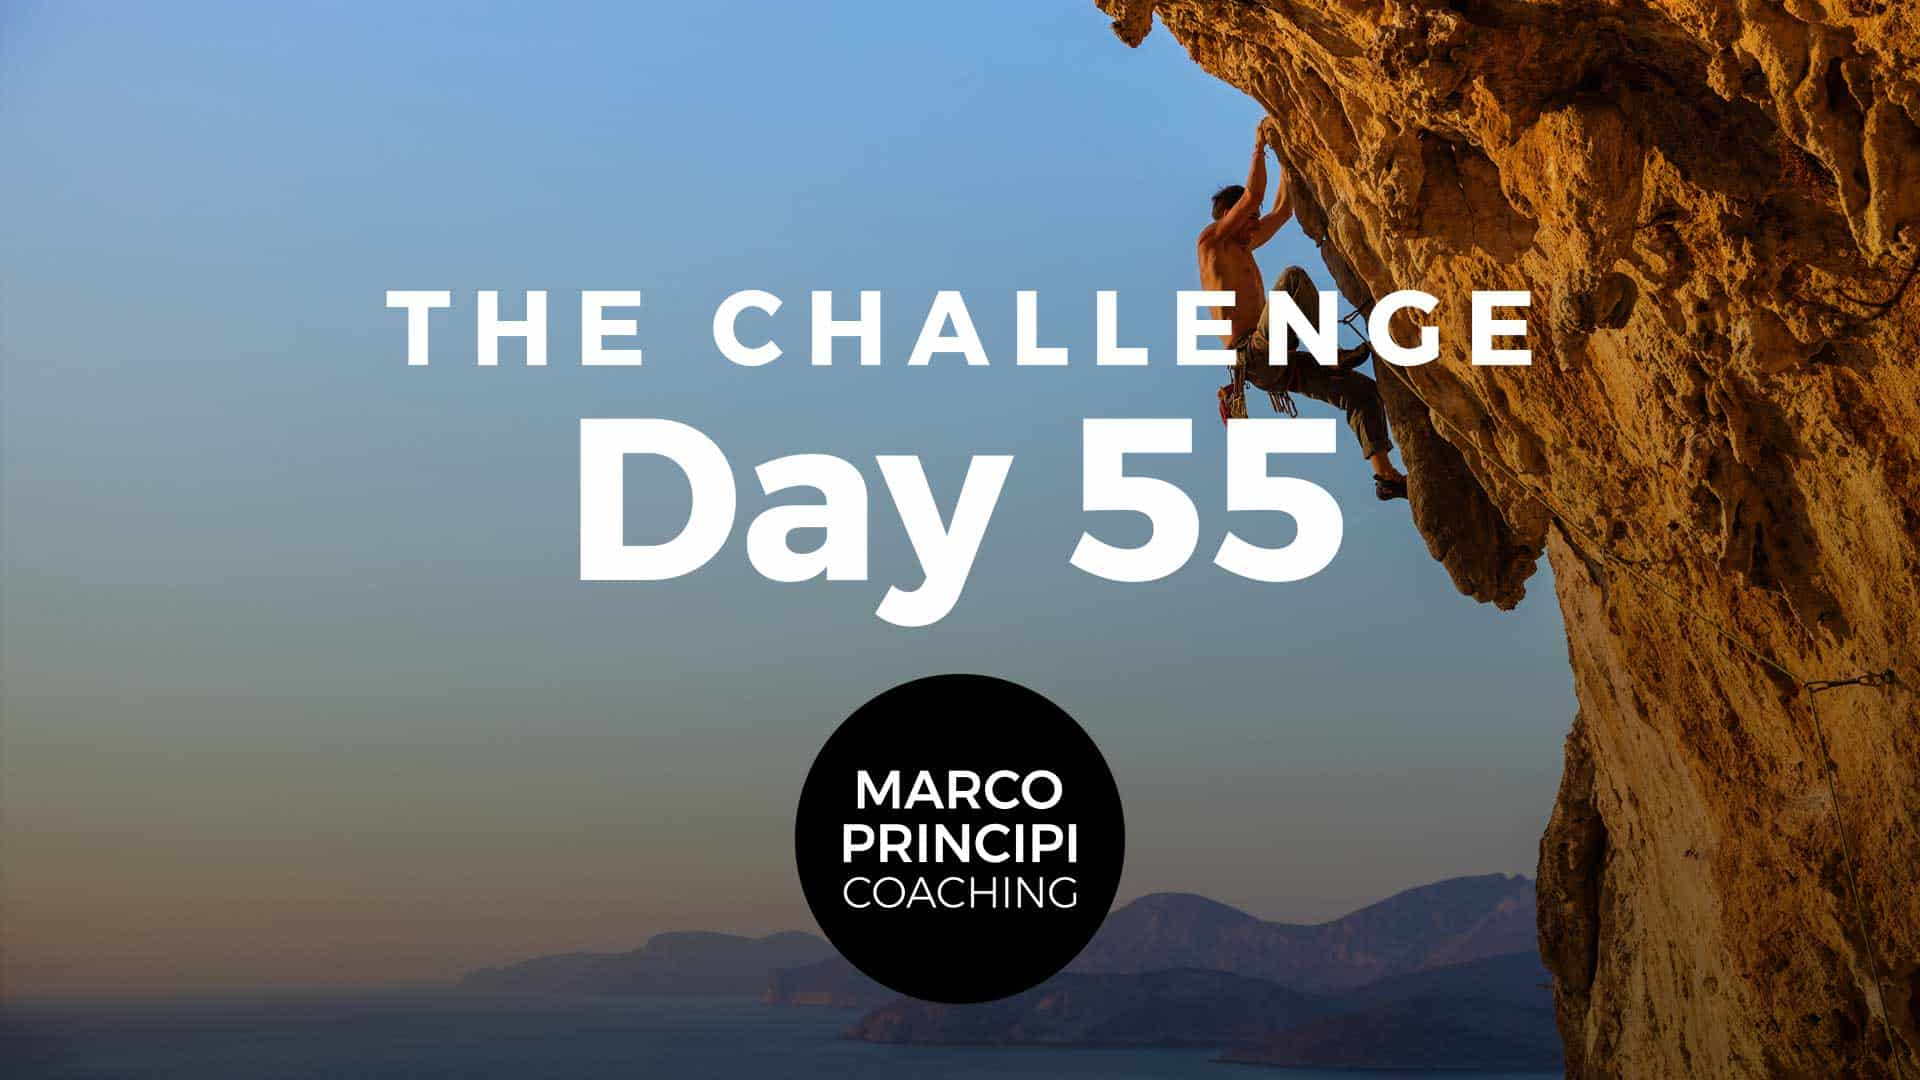 Marco Principi The Challenge Day 55